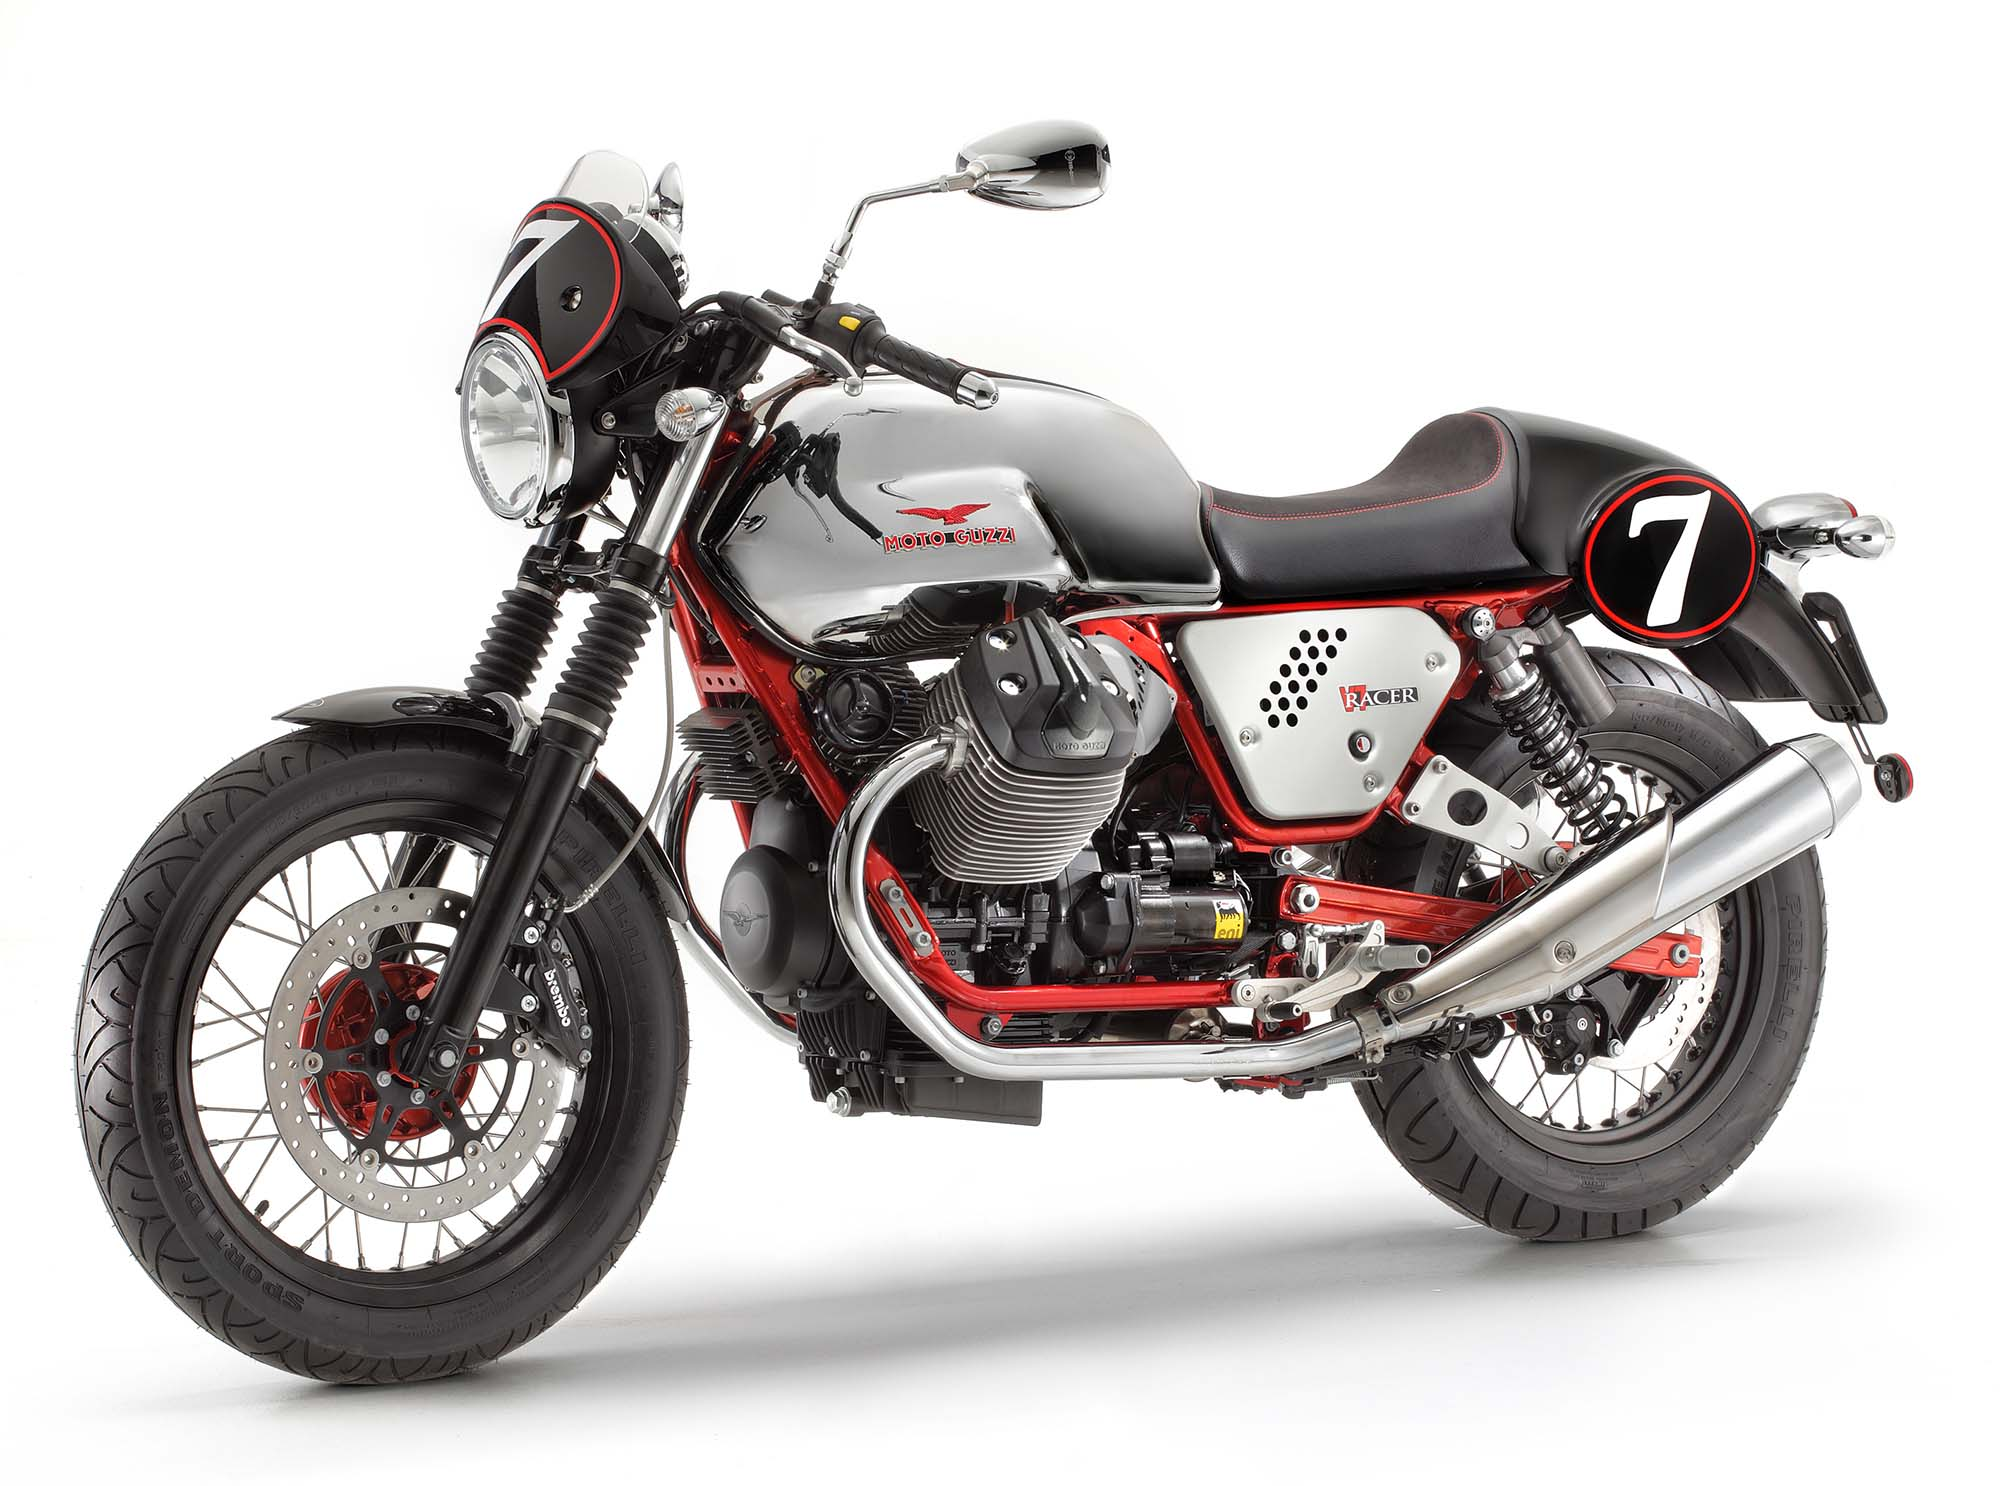 Moto Guzzi V7 stone motorcycle showcase at AUTO EXPO 2014 – INDIA ON ...